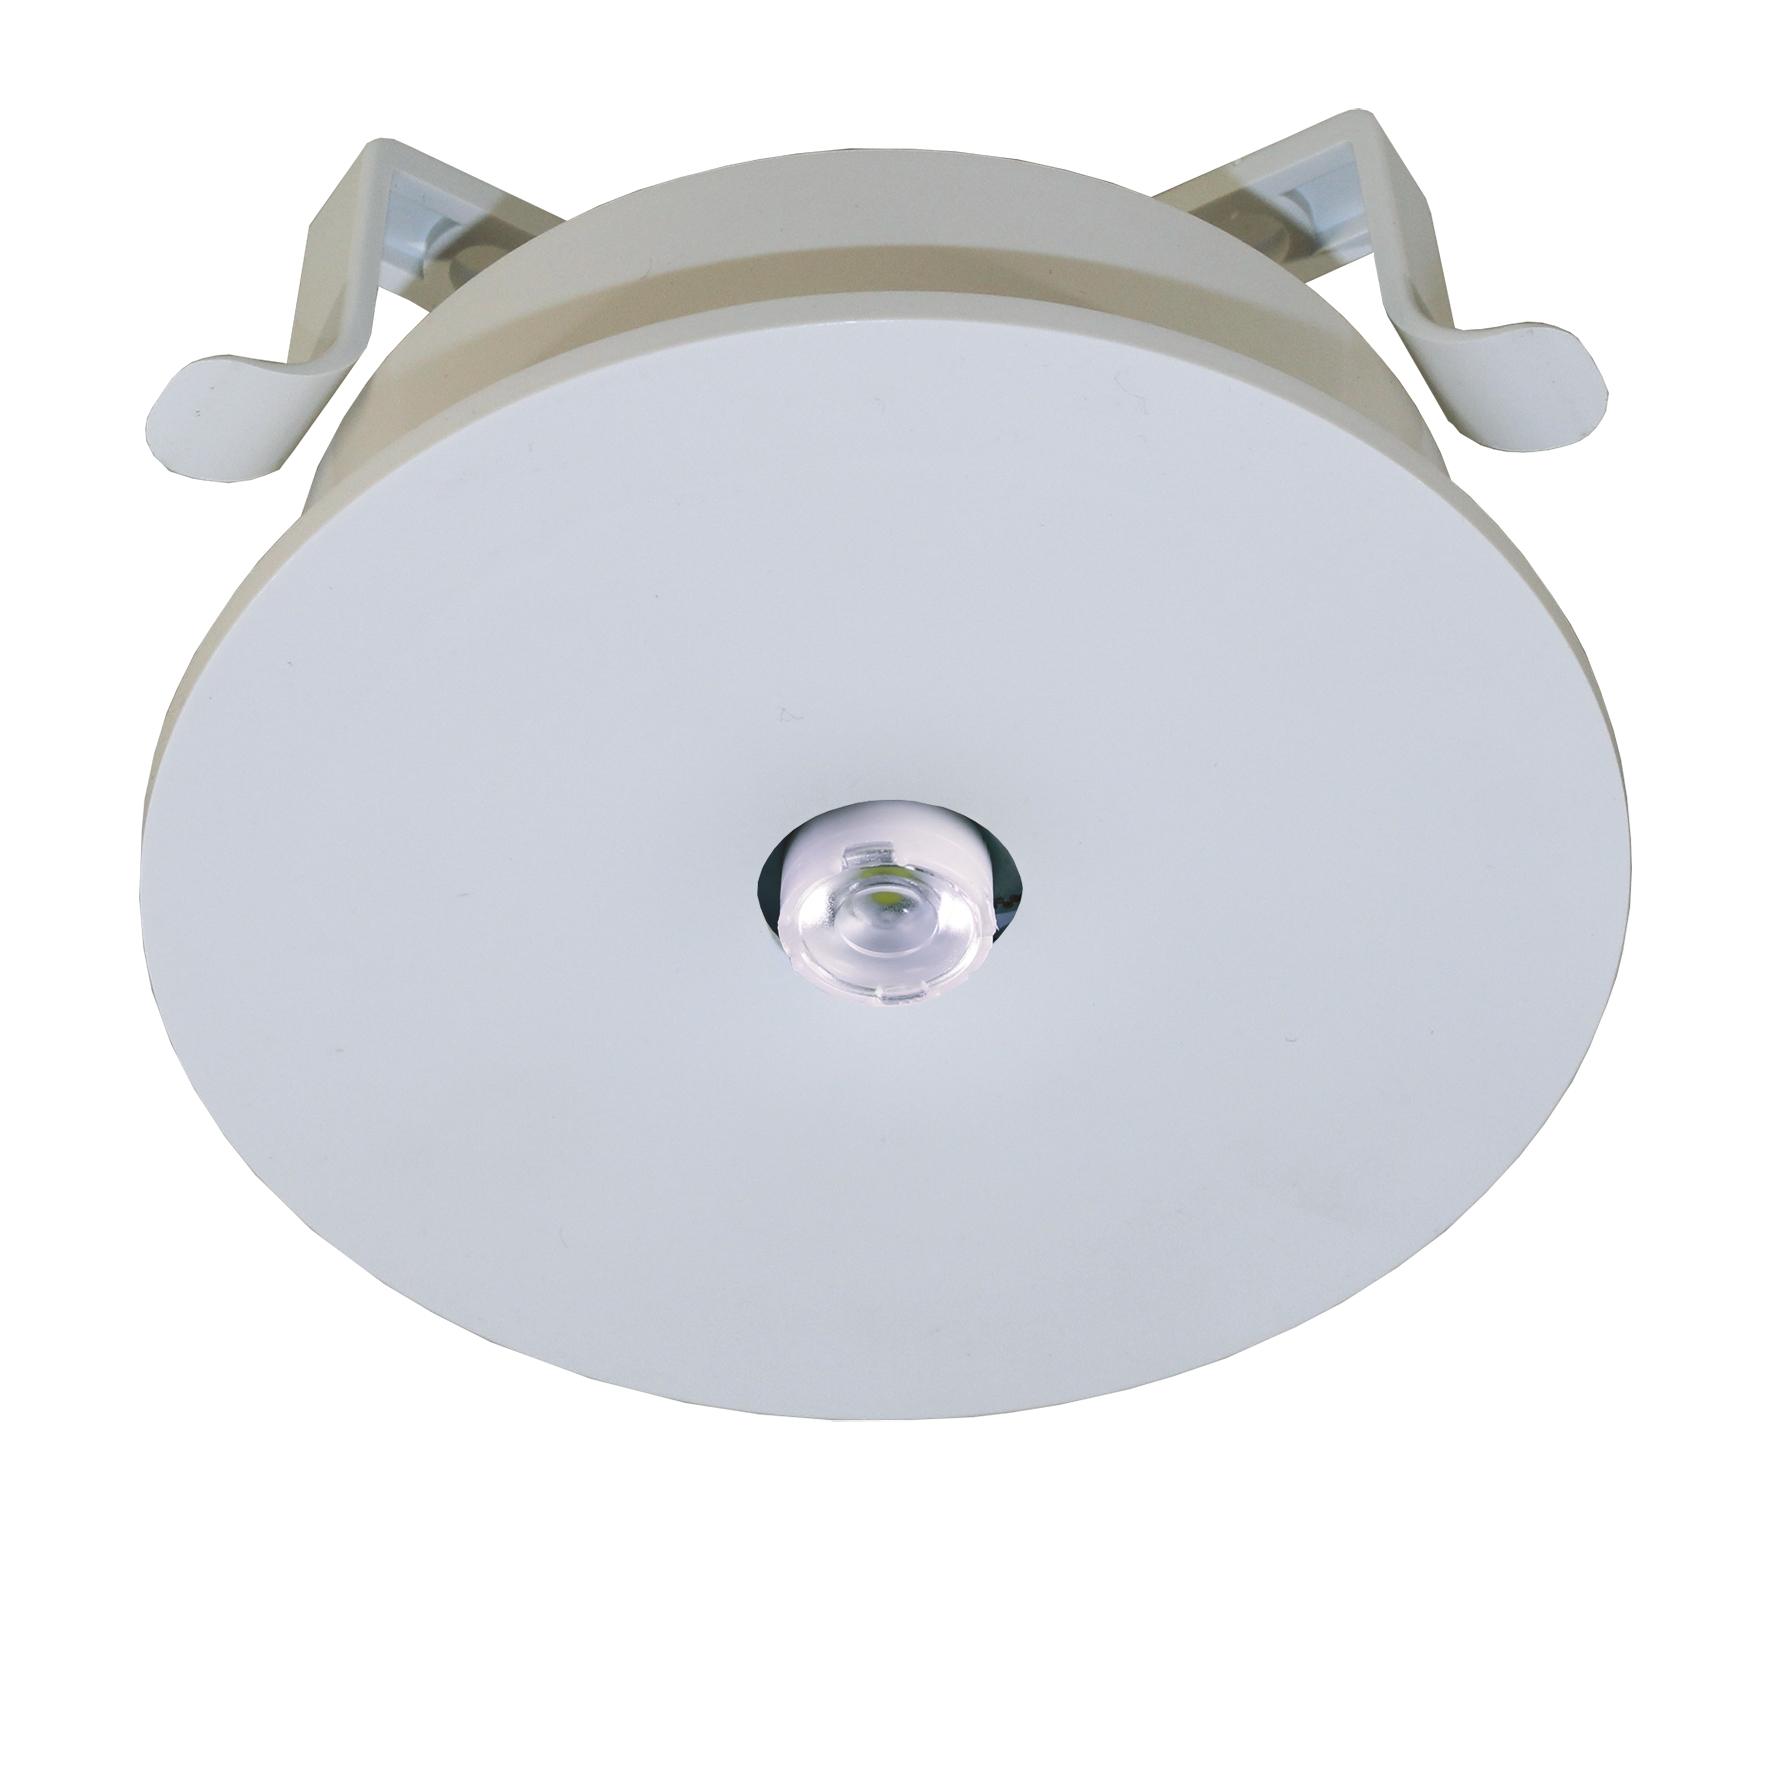 1 Stk Notleuchte IL  1x3W ERT-LED 230V EL Spot Deckeneinbaumontage NLILES029E